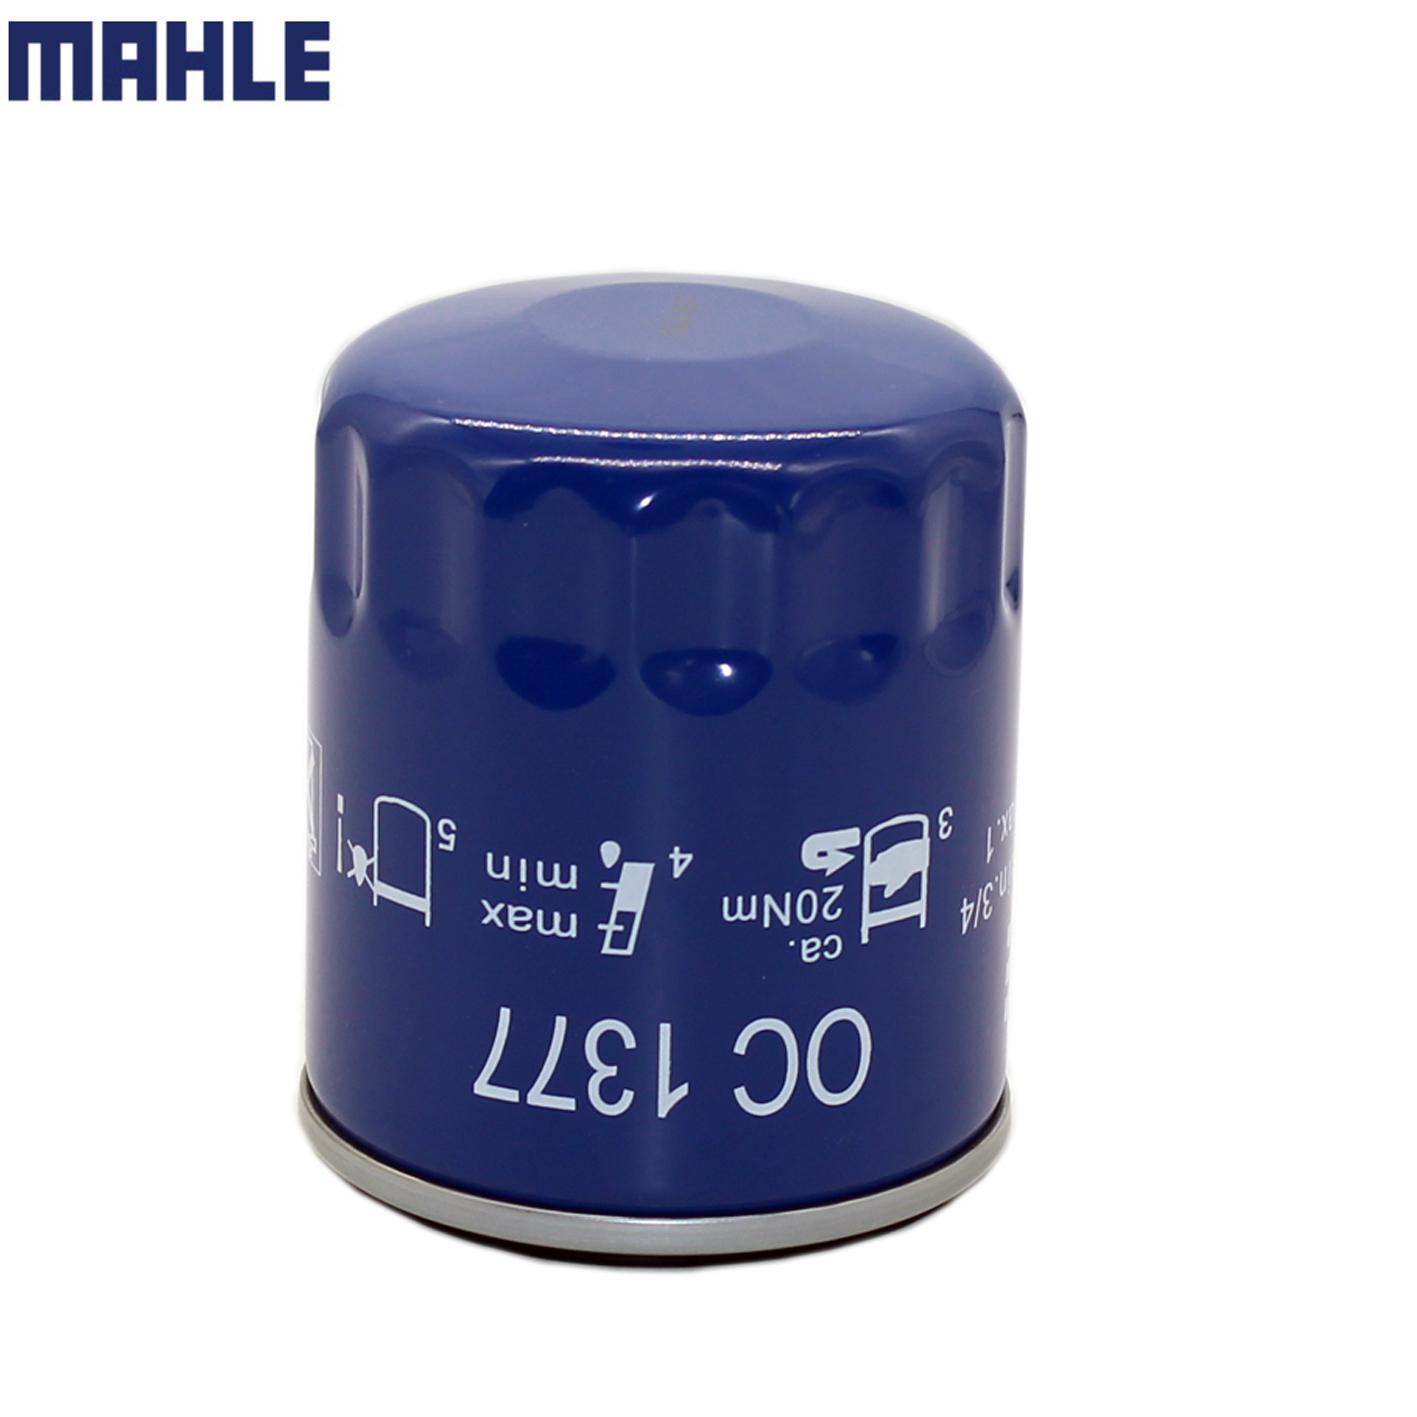 �R勒�C油�V芯格OC1377�m用于�e克雪佛�m菲�S �L安 �P迪拉克帝豪